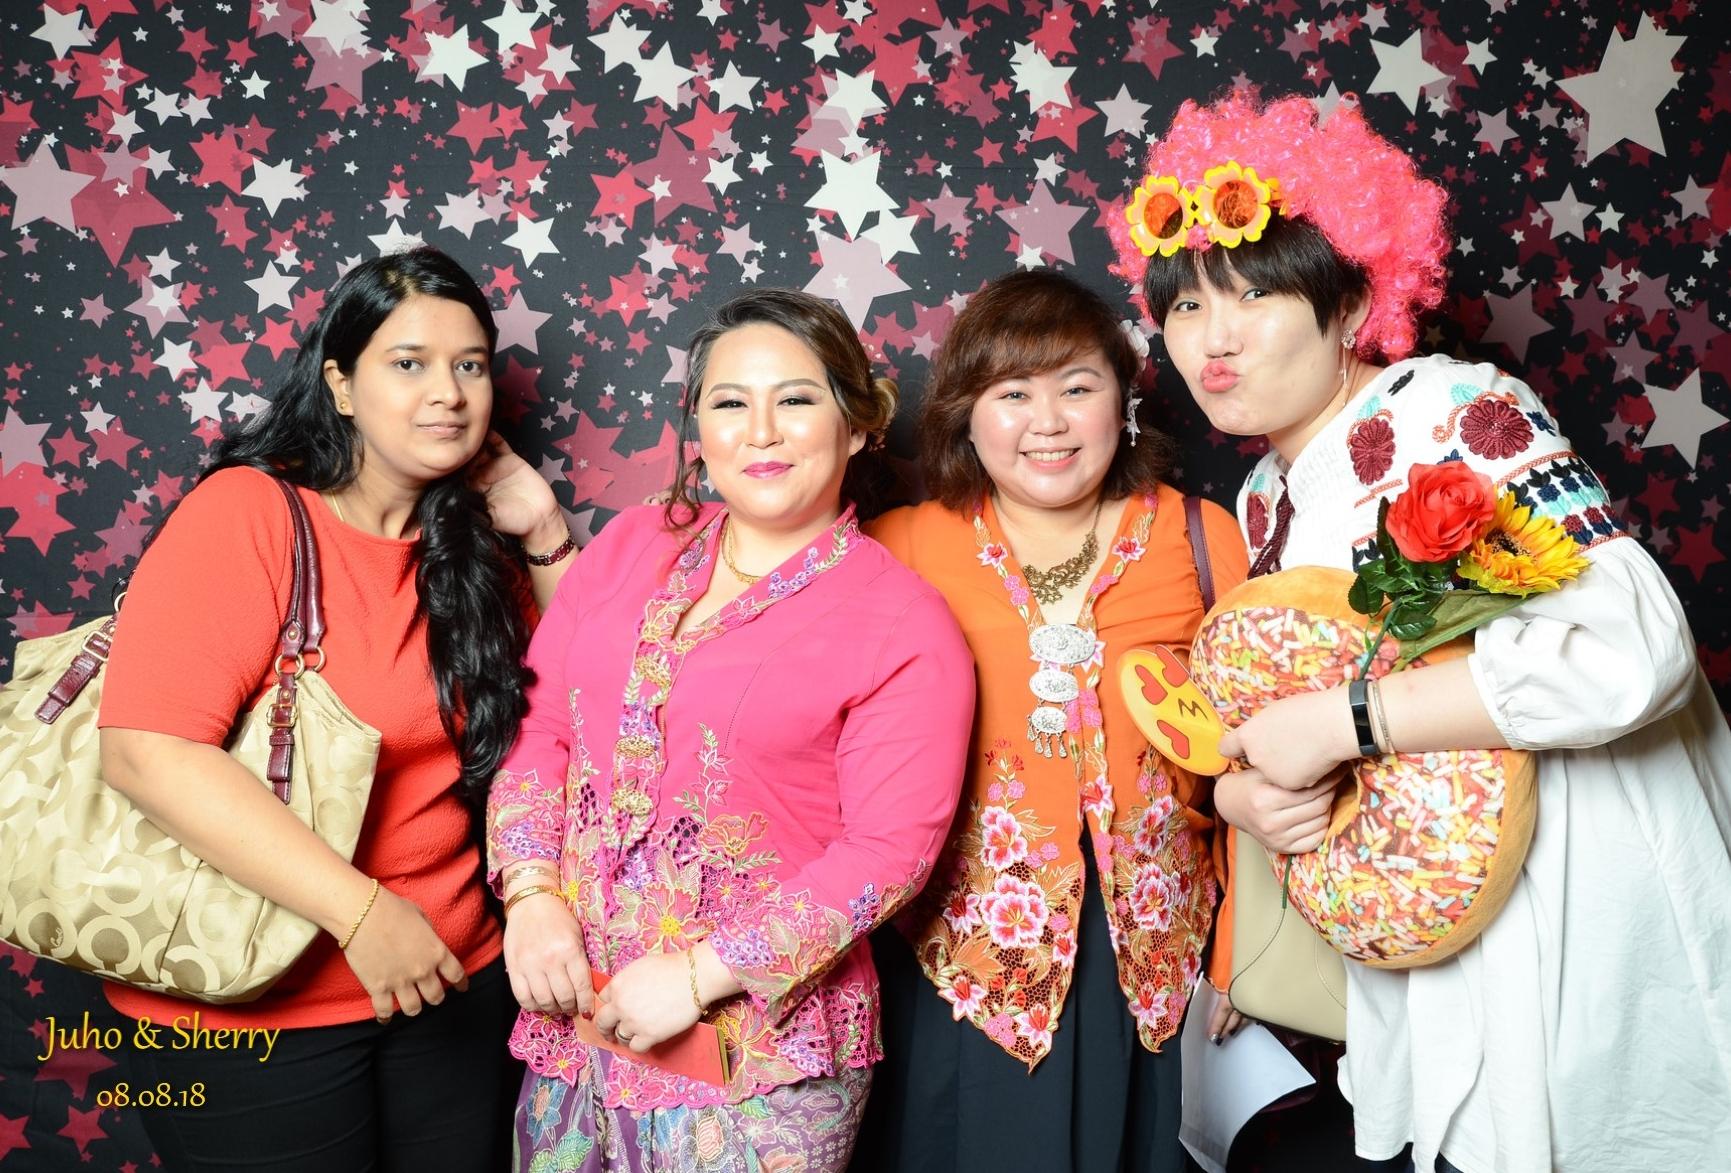 Juho & Sherry Peranakan Wedding on 8 August 2018